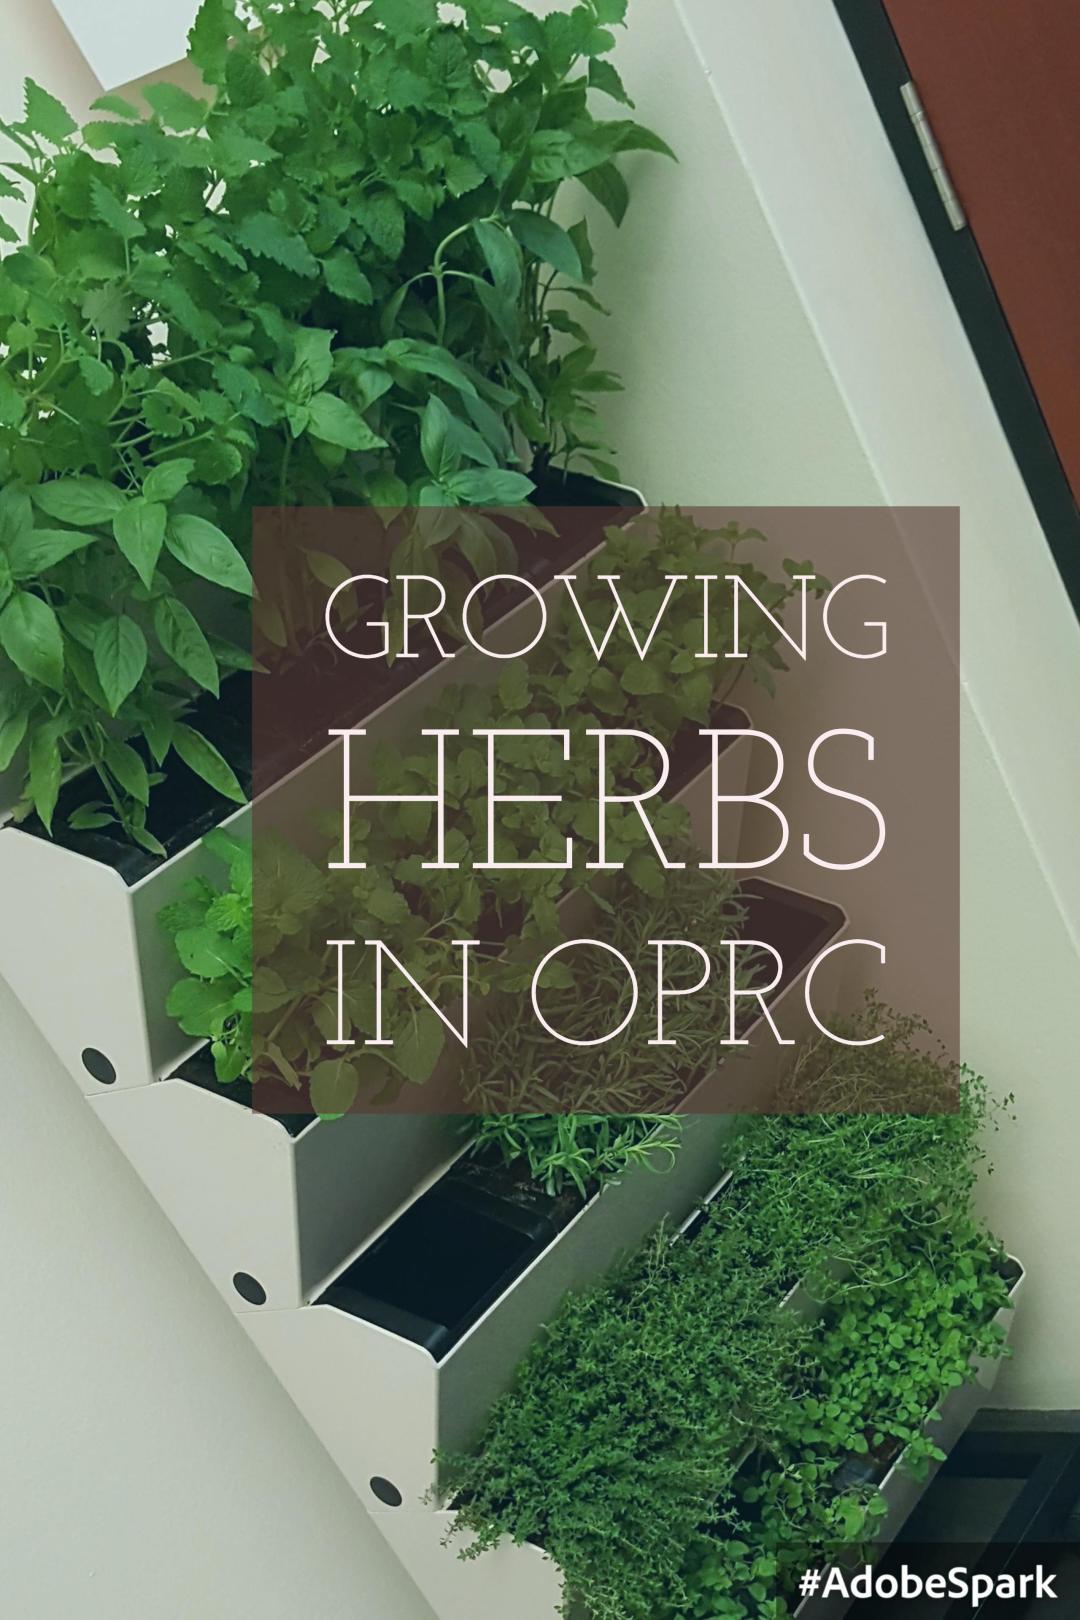 OPRC growing herbs in OPRC